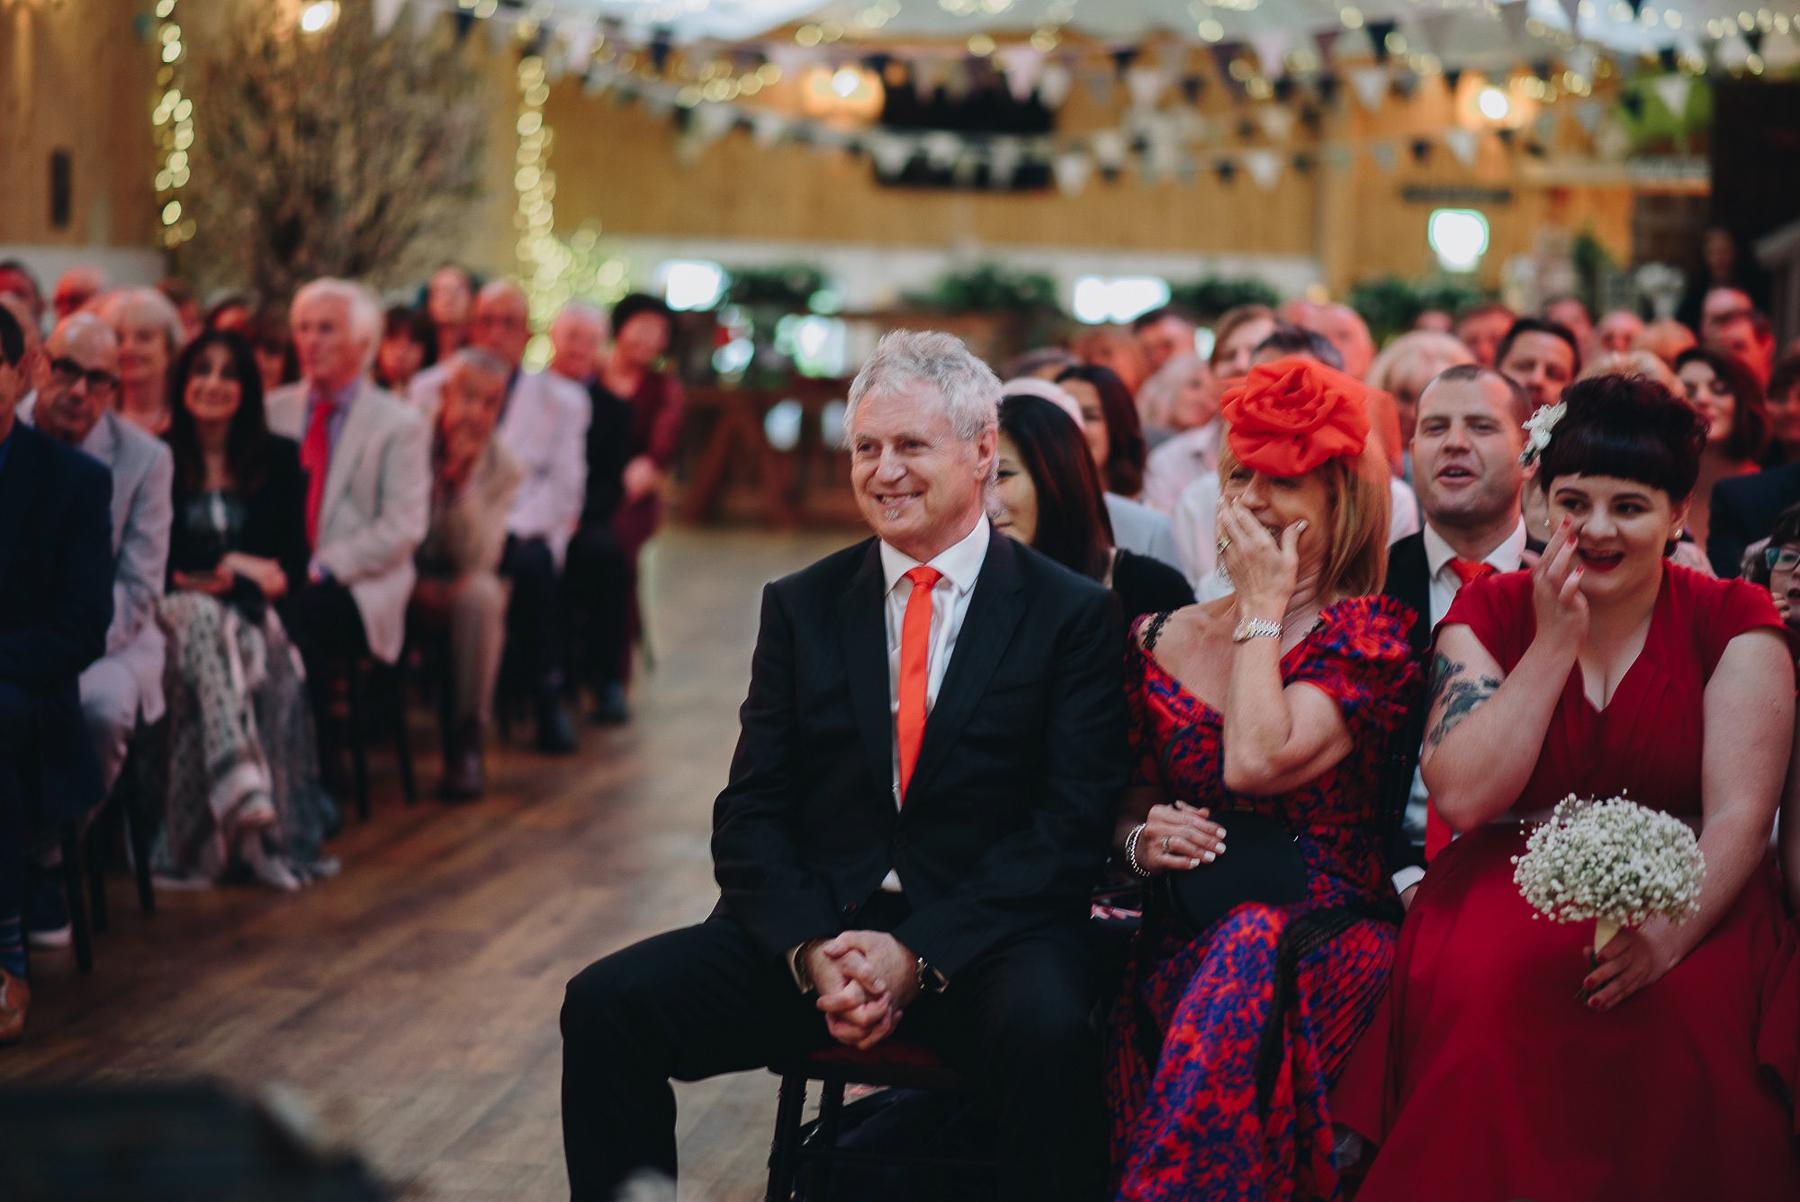 Wellbeing_Farm_Wedding_Photography_The_Pin-Up_Bride_Lara_Shaun-65.jpg